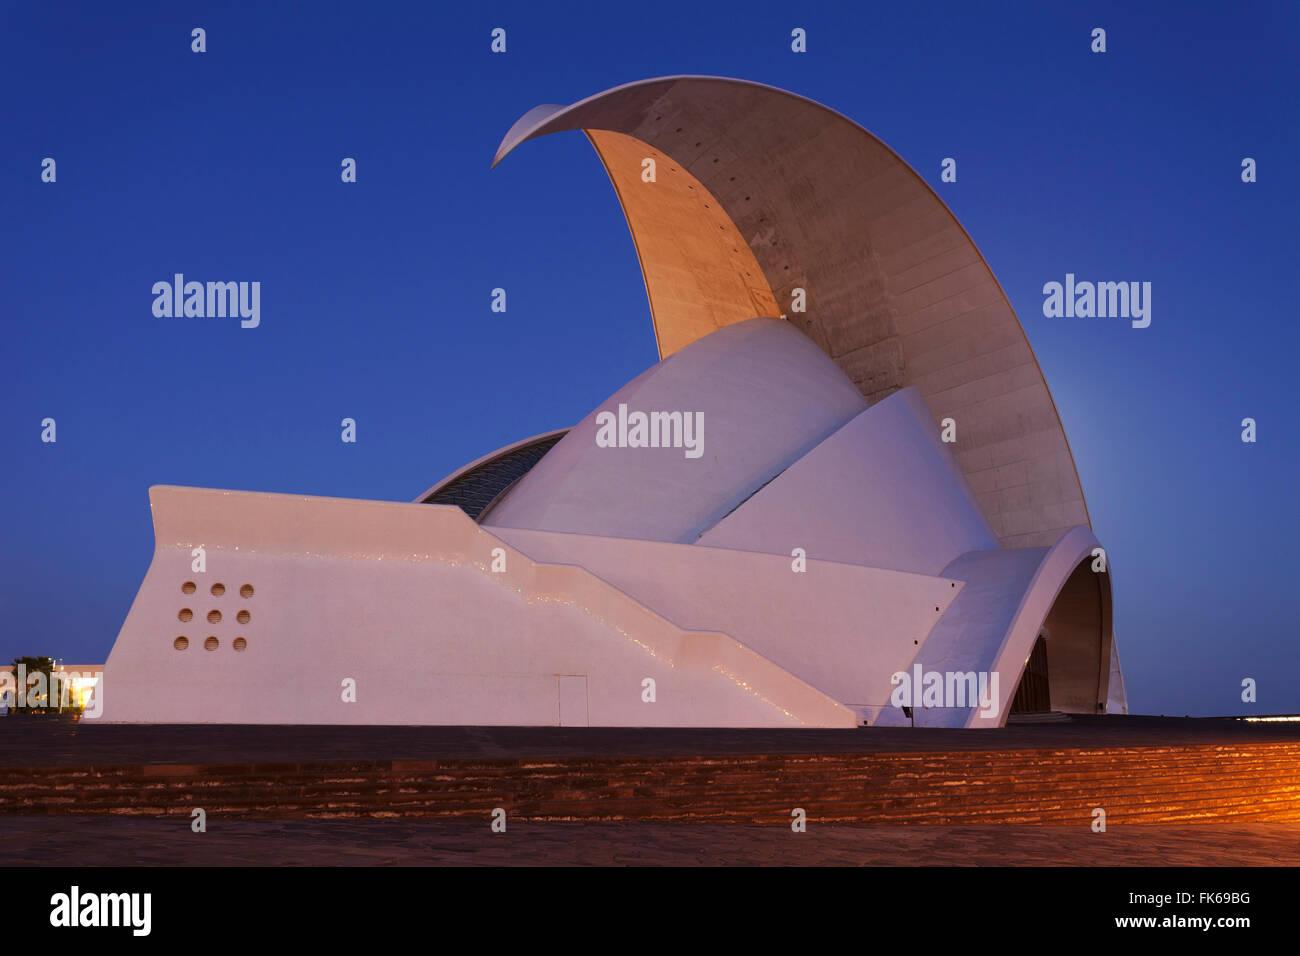 Auditorium by the architect Santiago Calatrava, Santa Cruz, Tenerife, Canary Islands, Spain, Europe - Stock Image